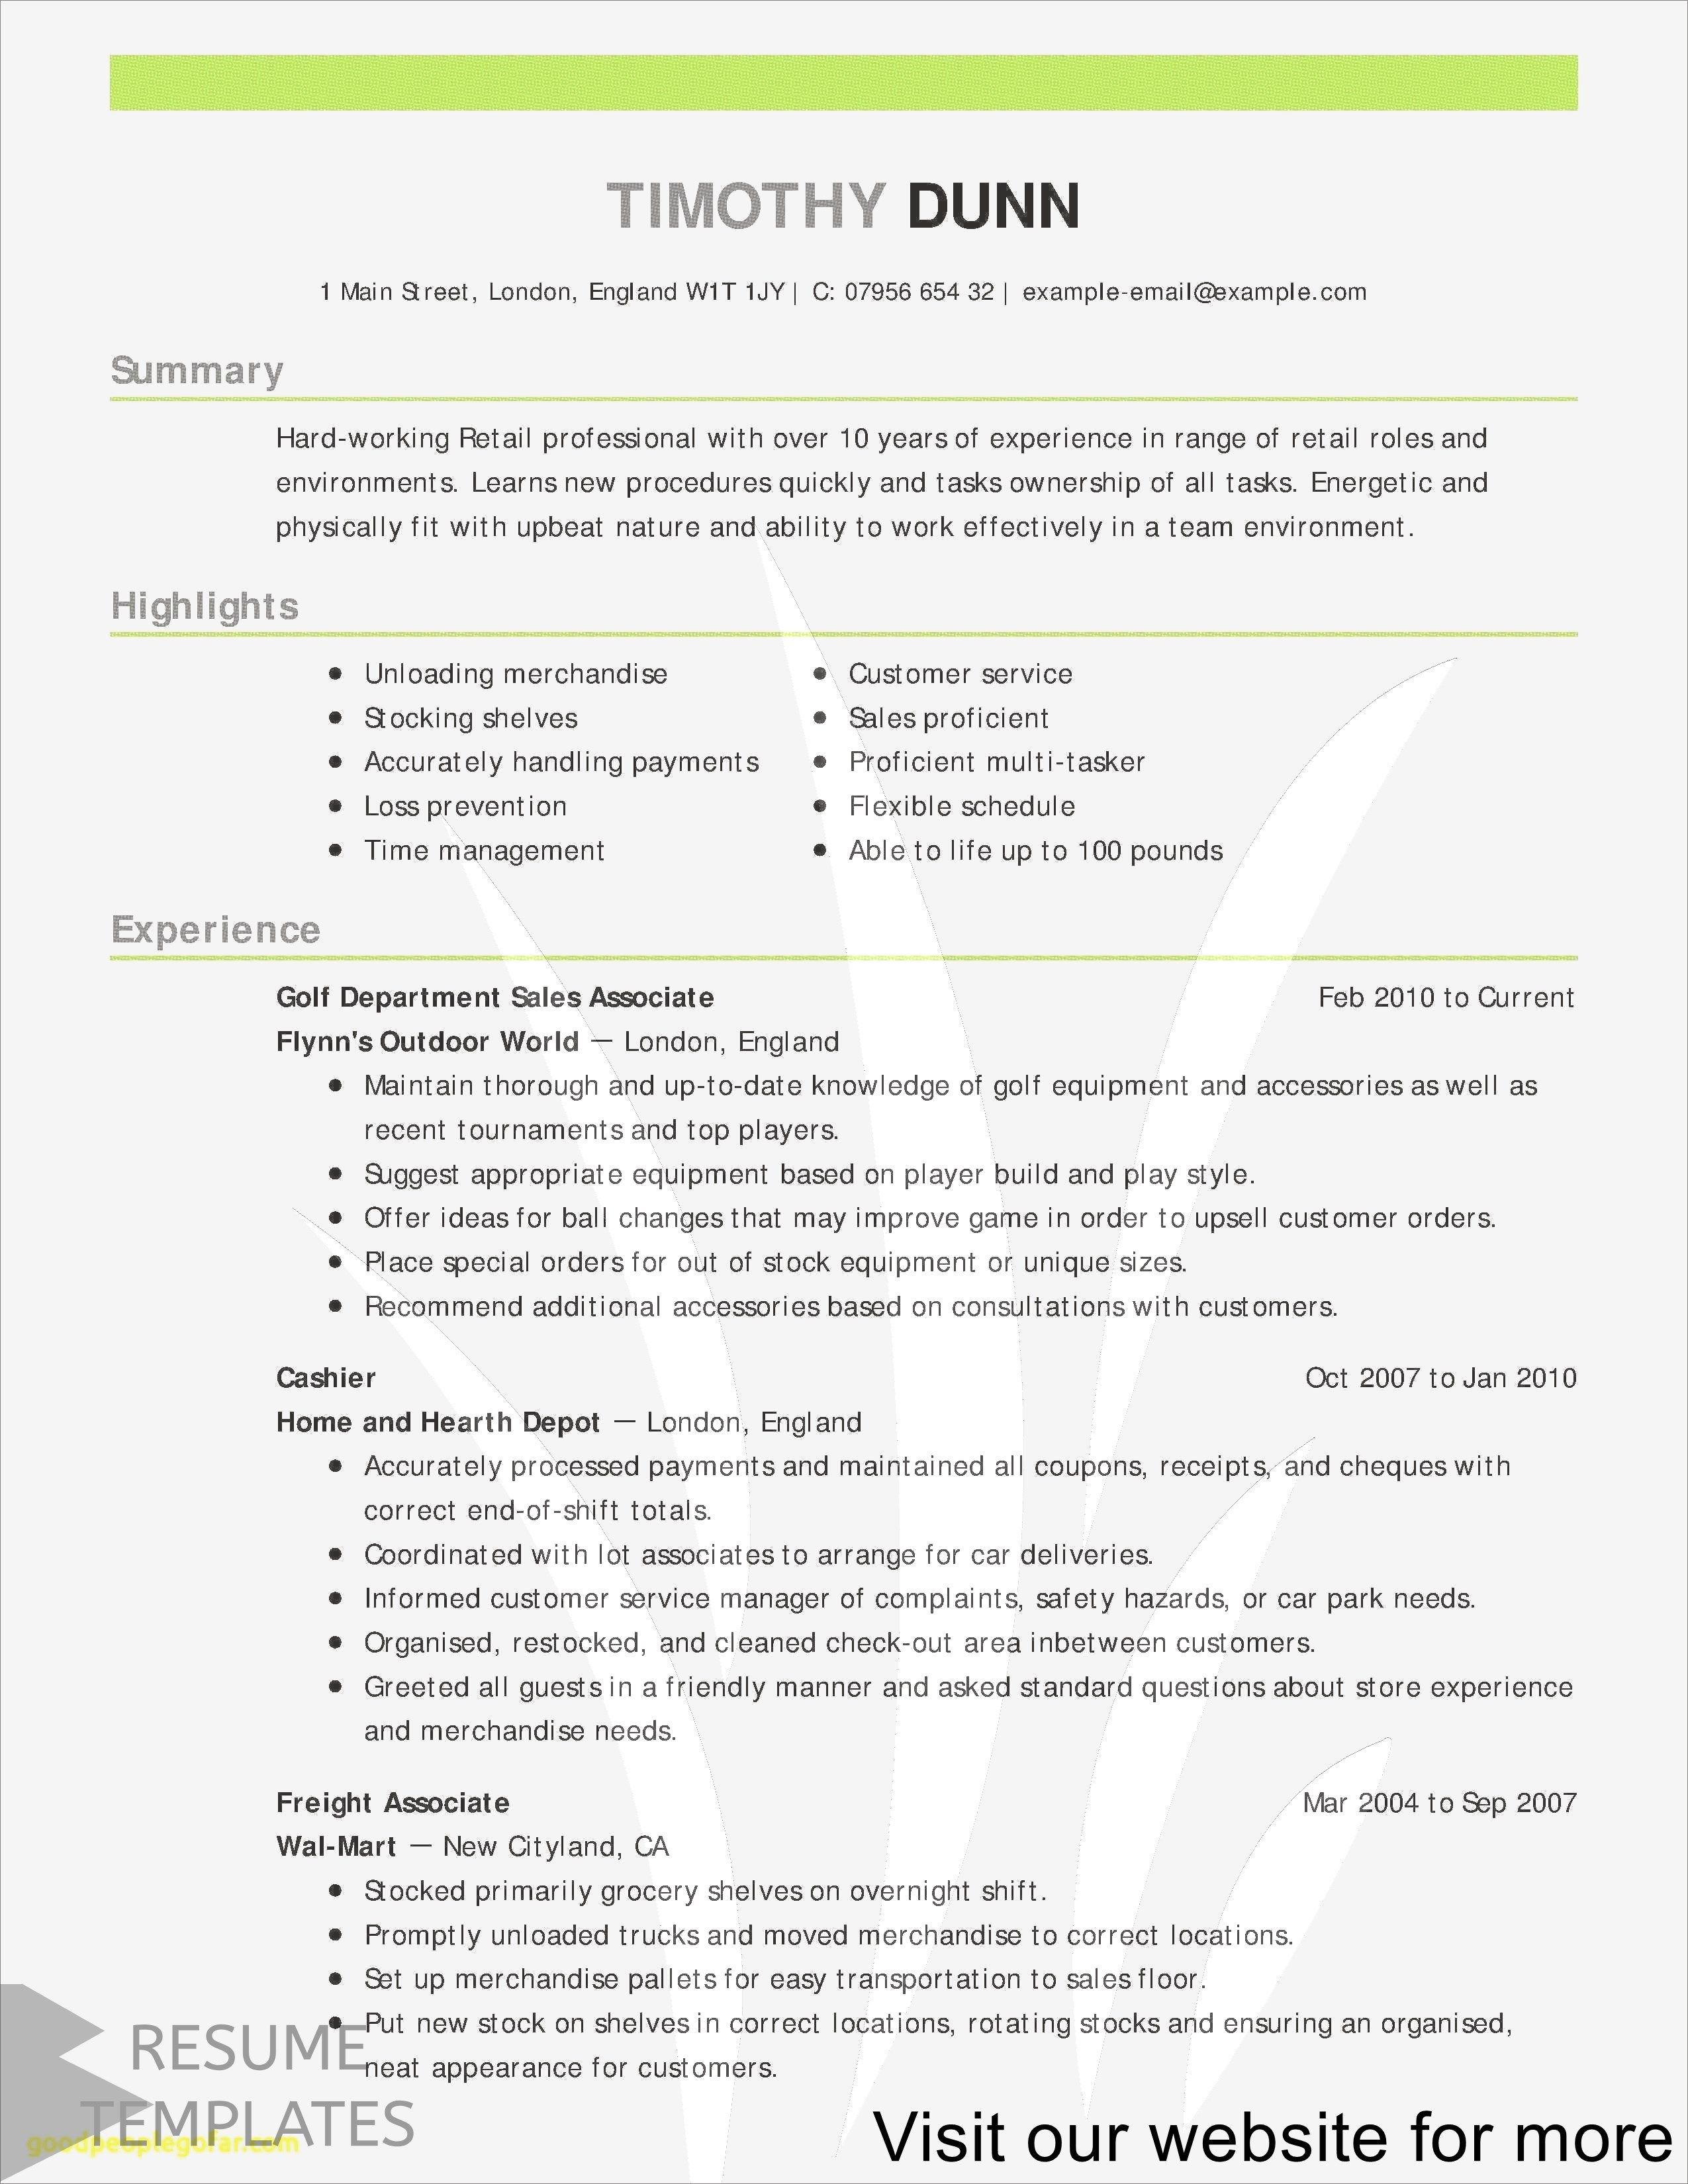 Resume Builder App Free Professional Resume Template Australia Resume Template Professional Resume Template